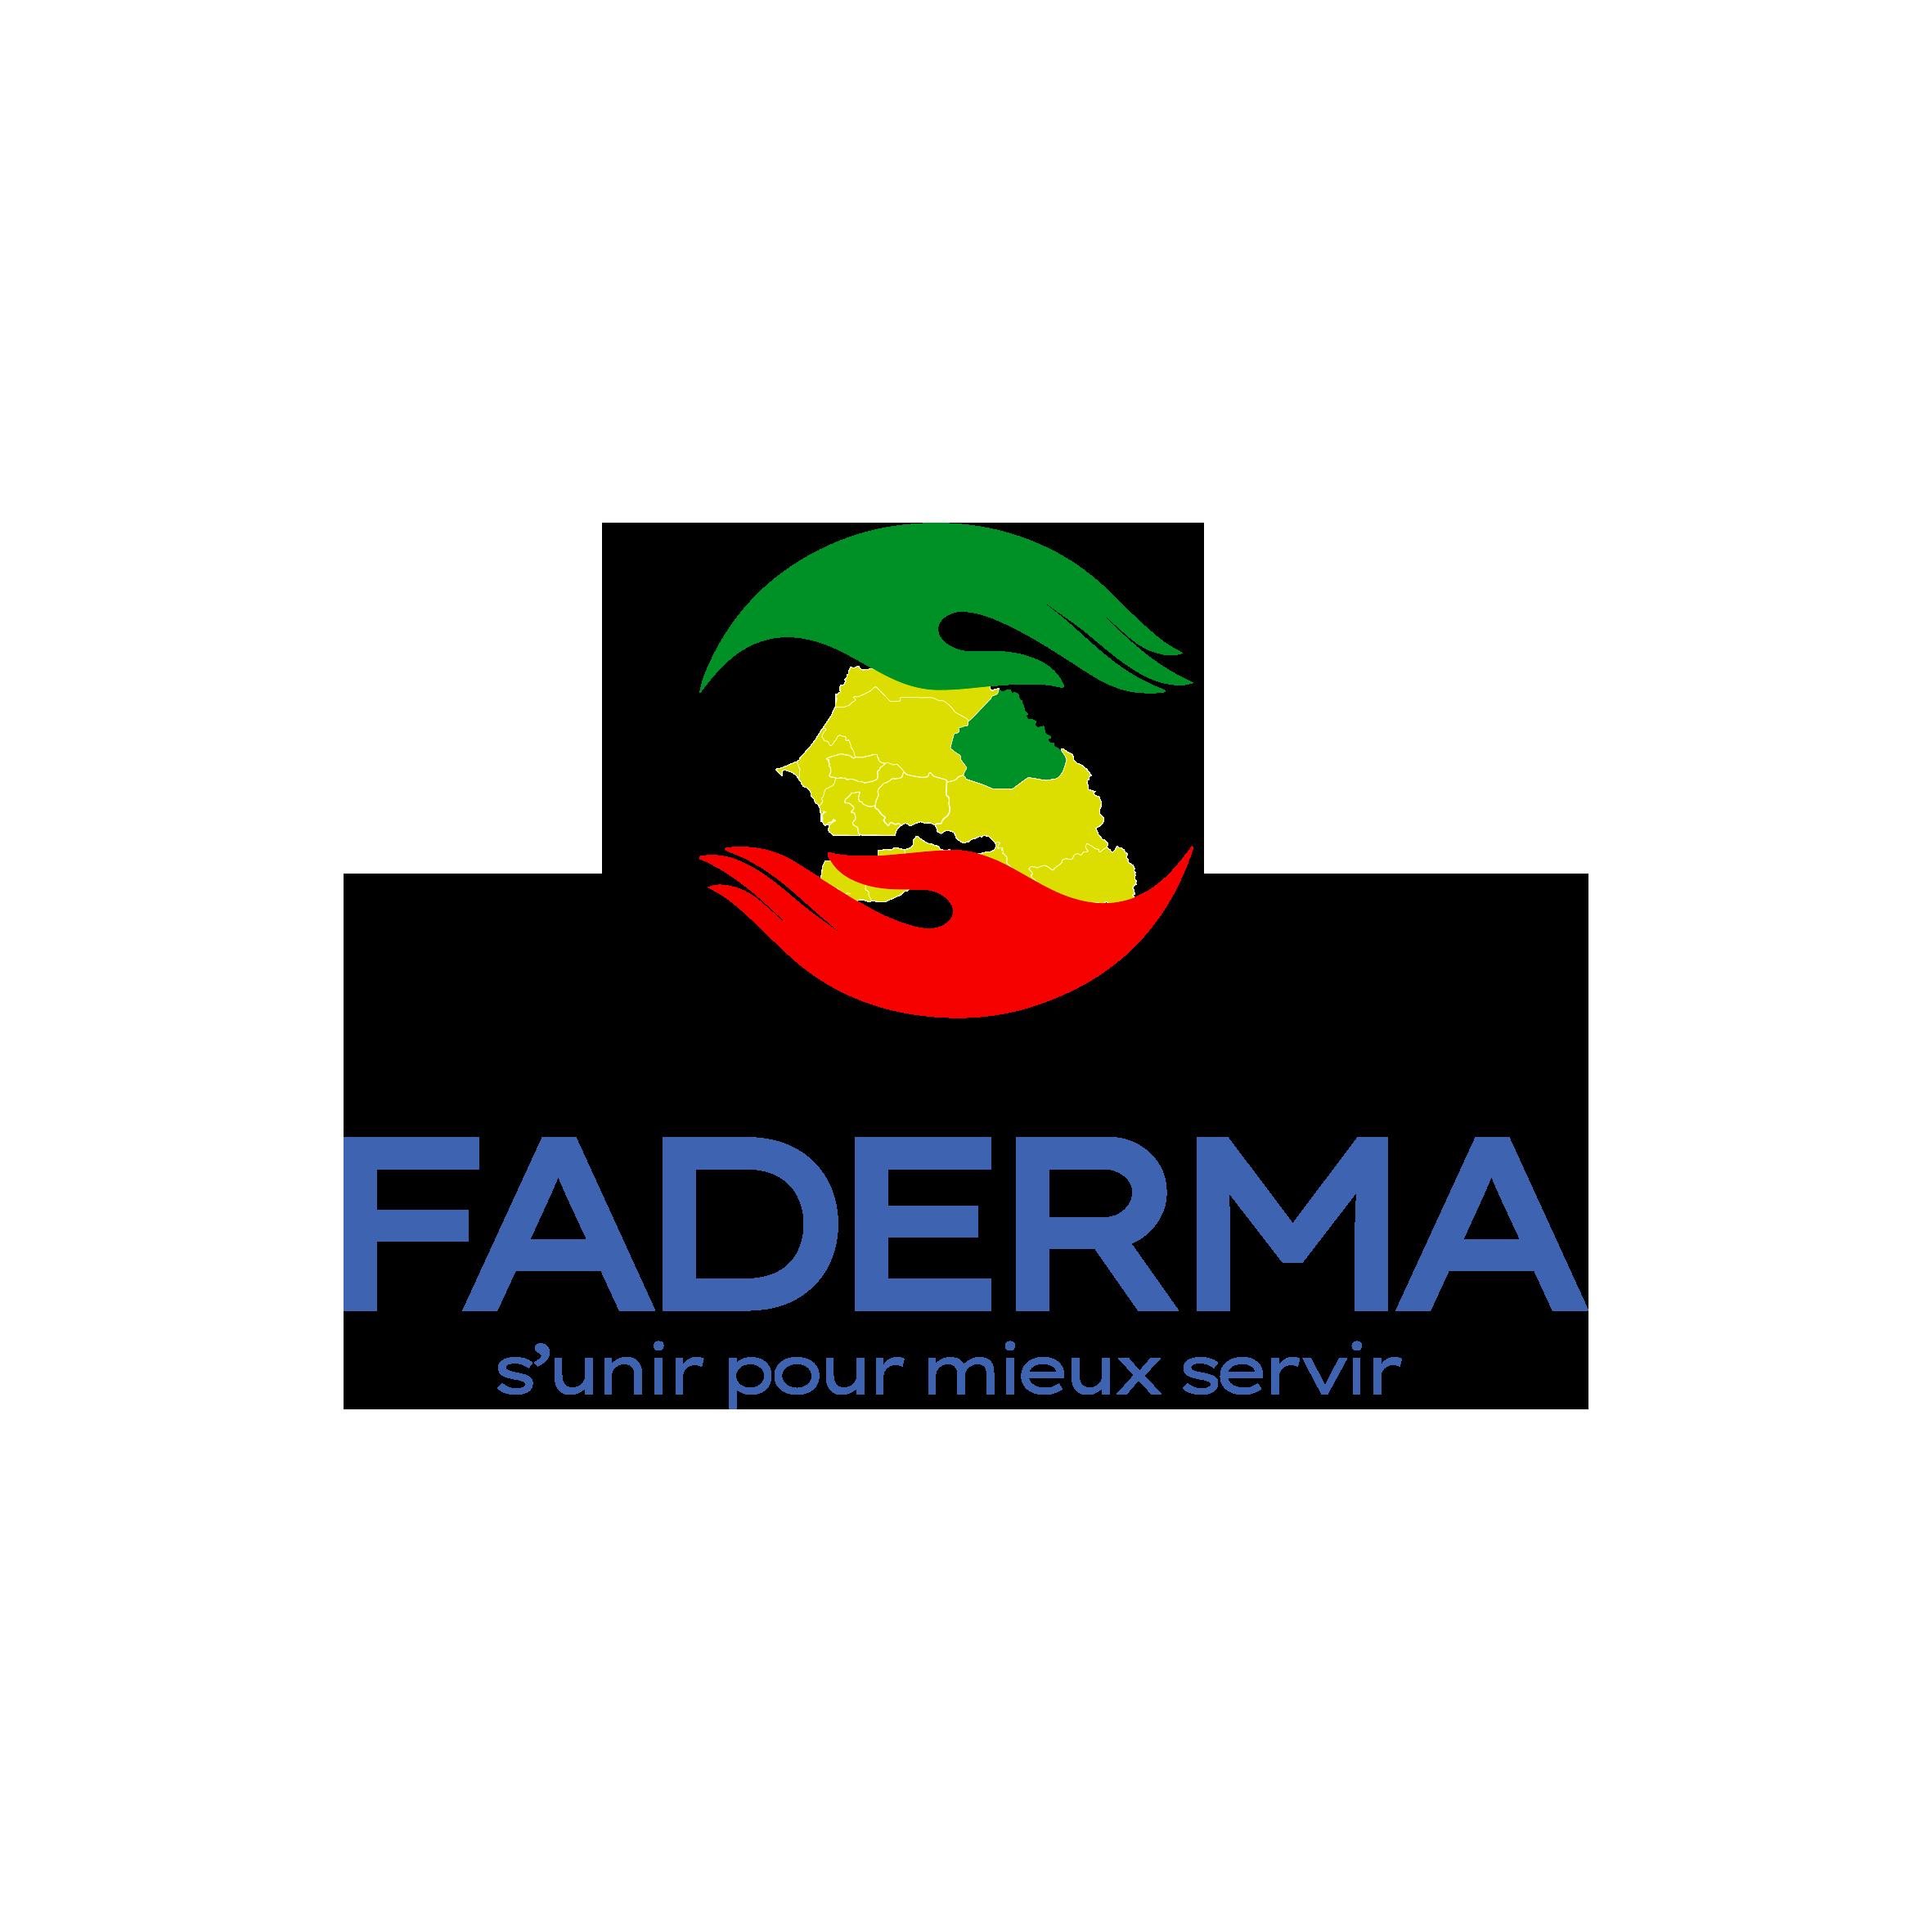 Faderma